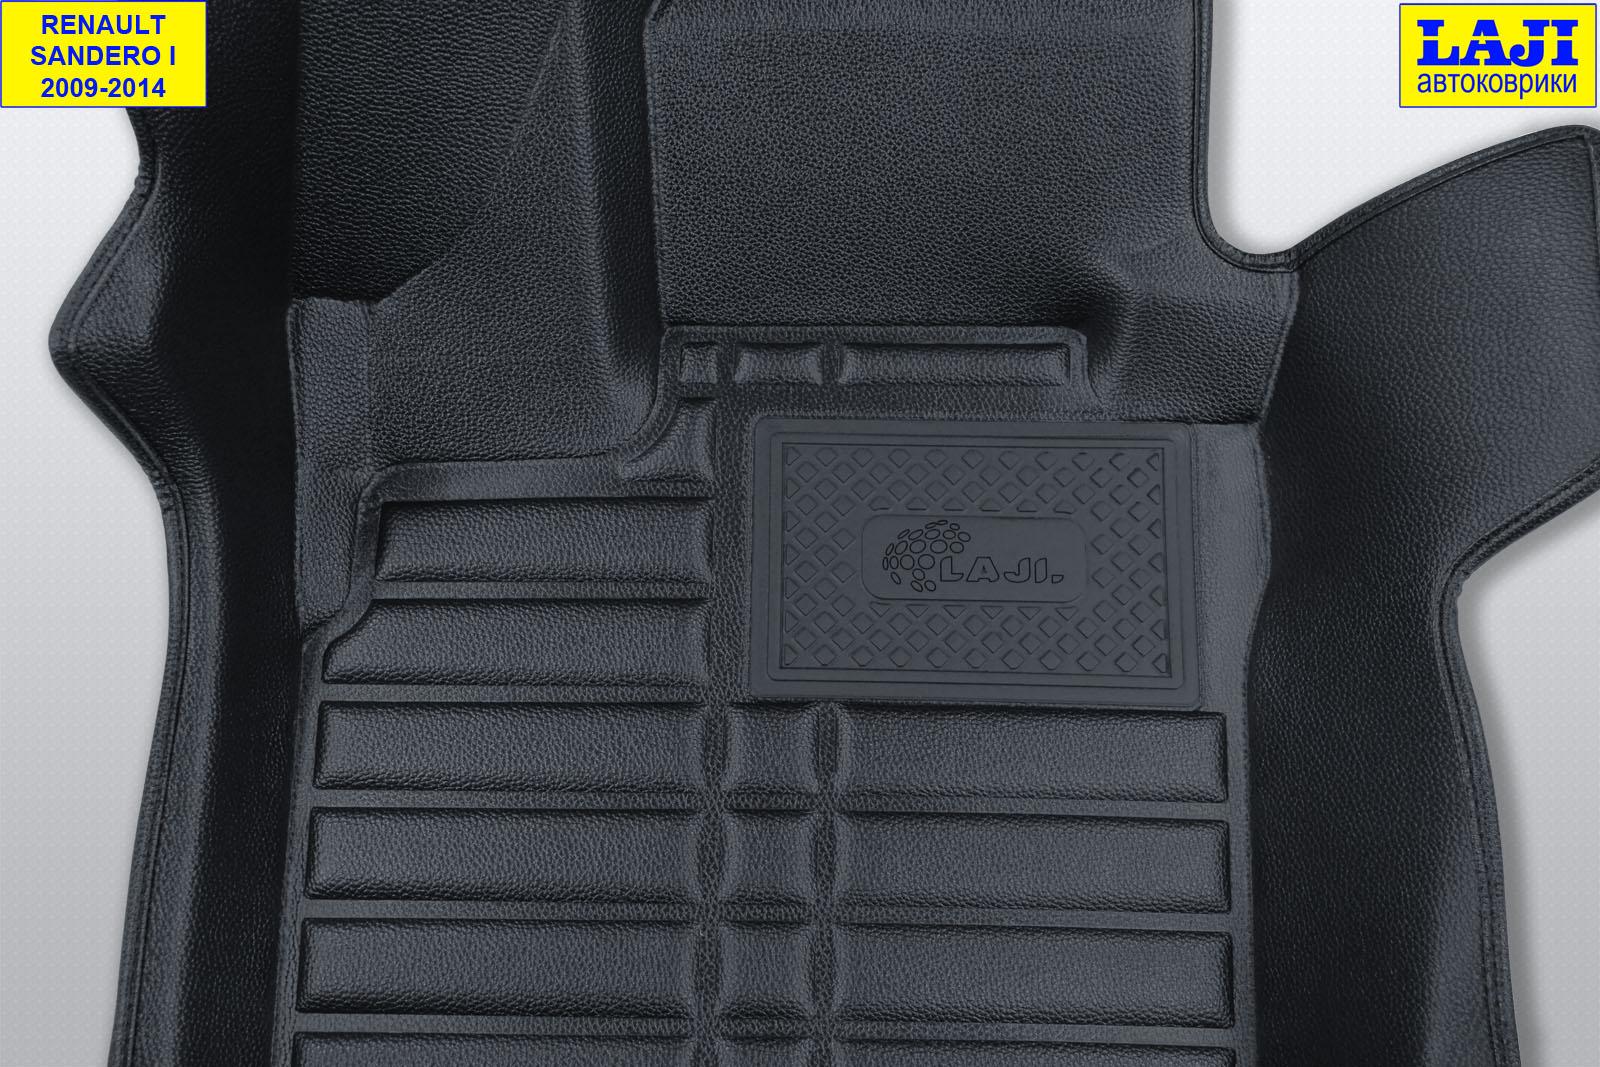 5D коврики в салон Renault Sandero 1 2009-2014 7